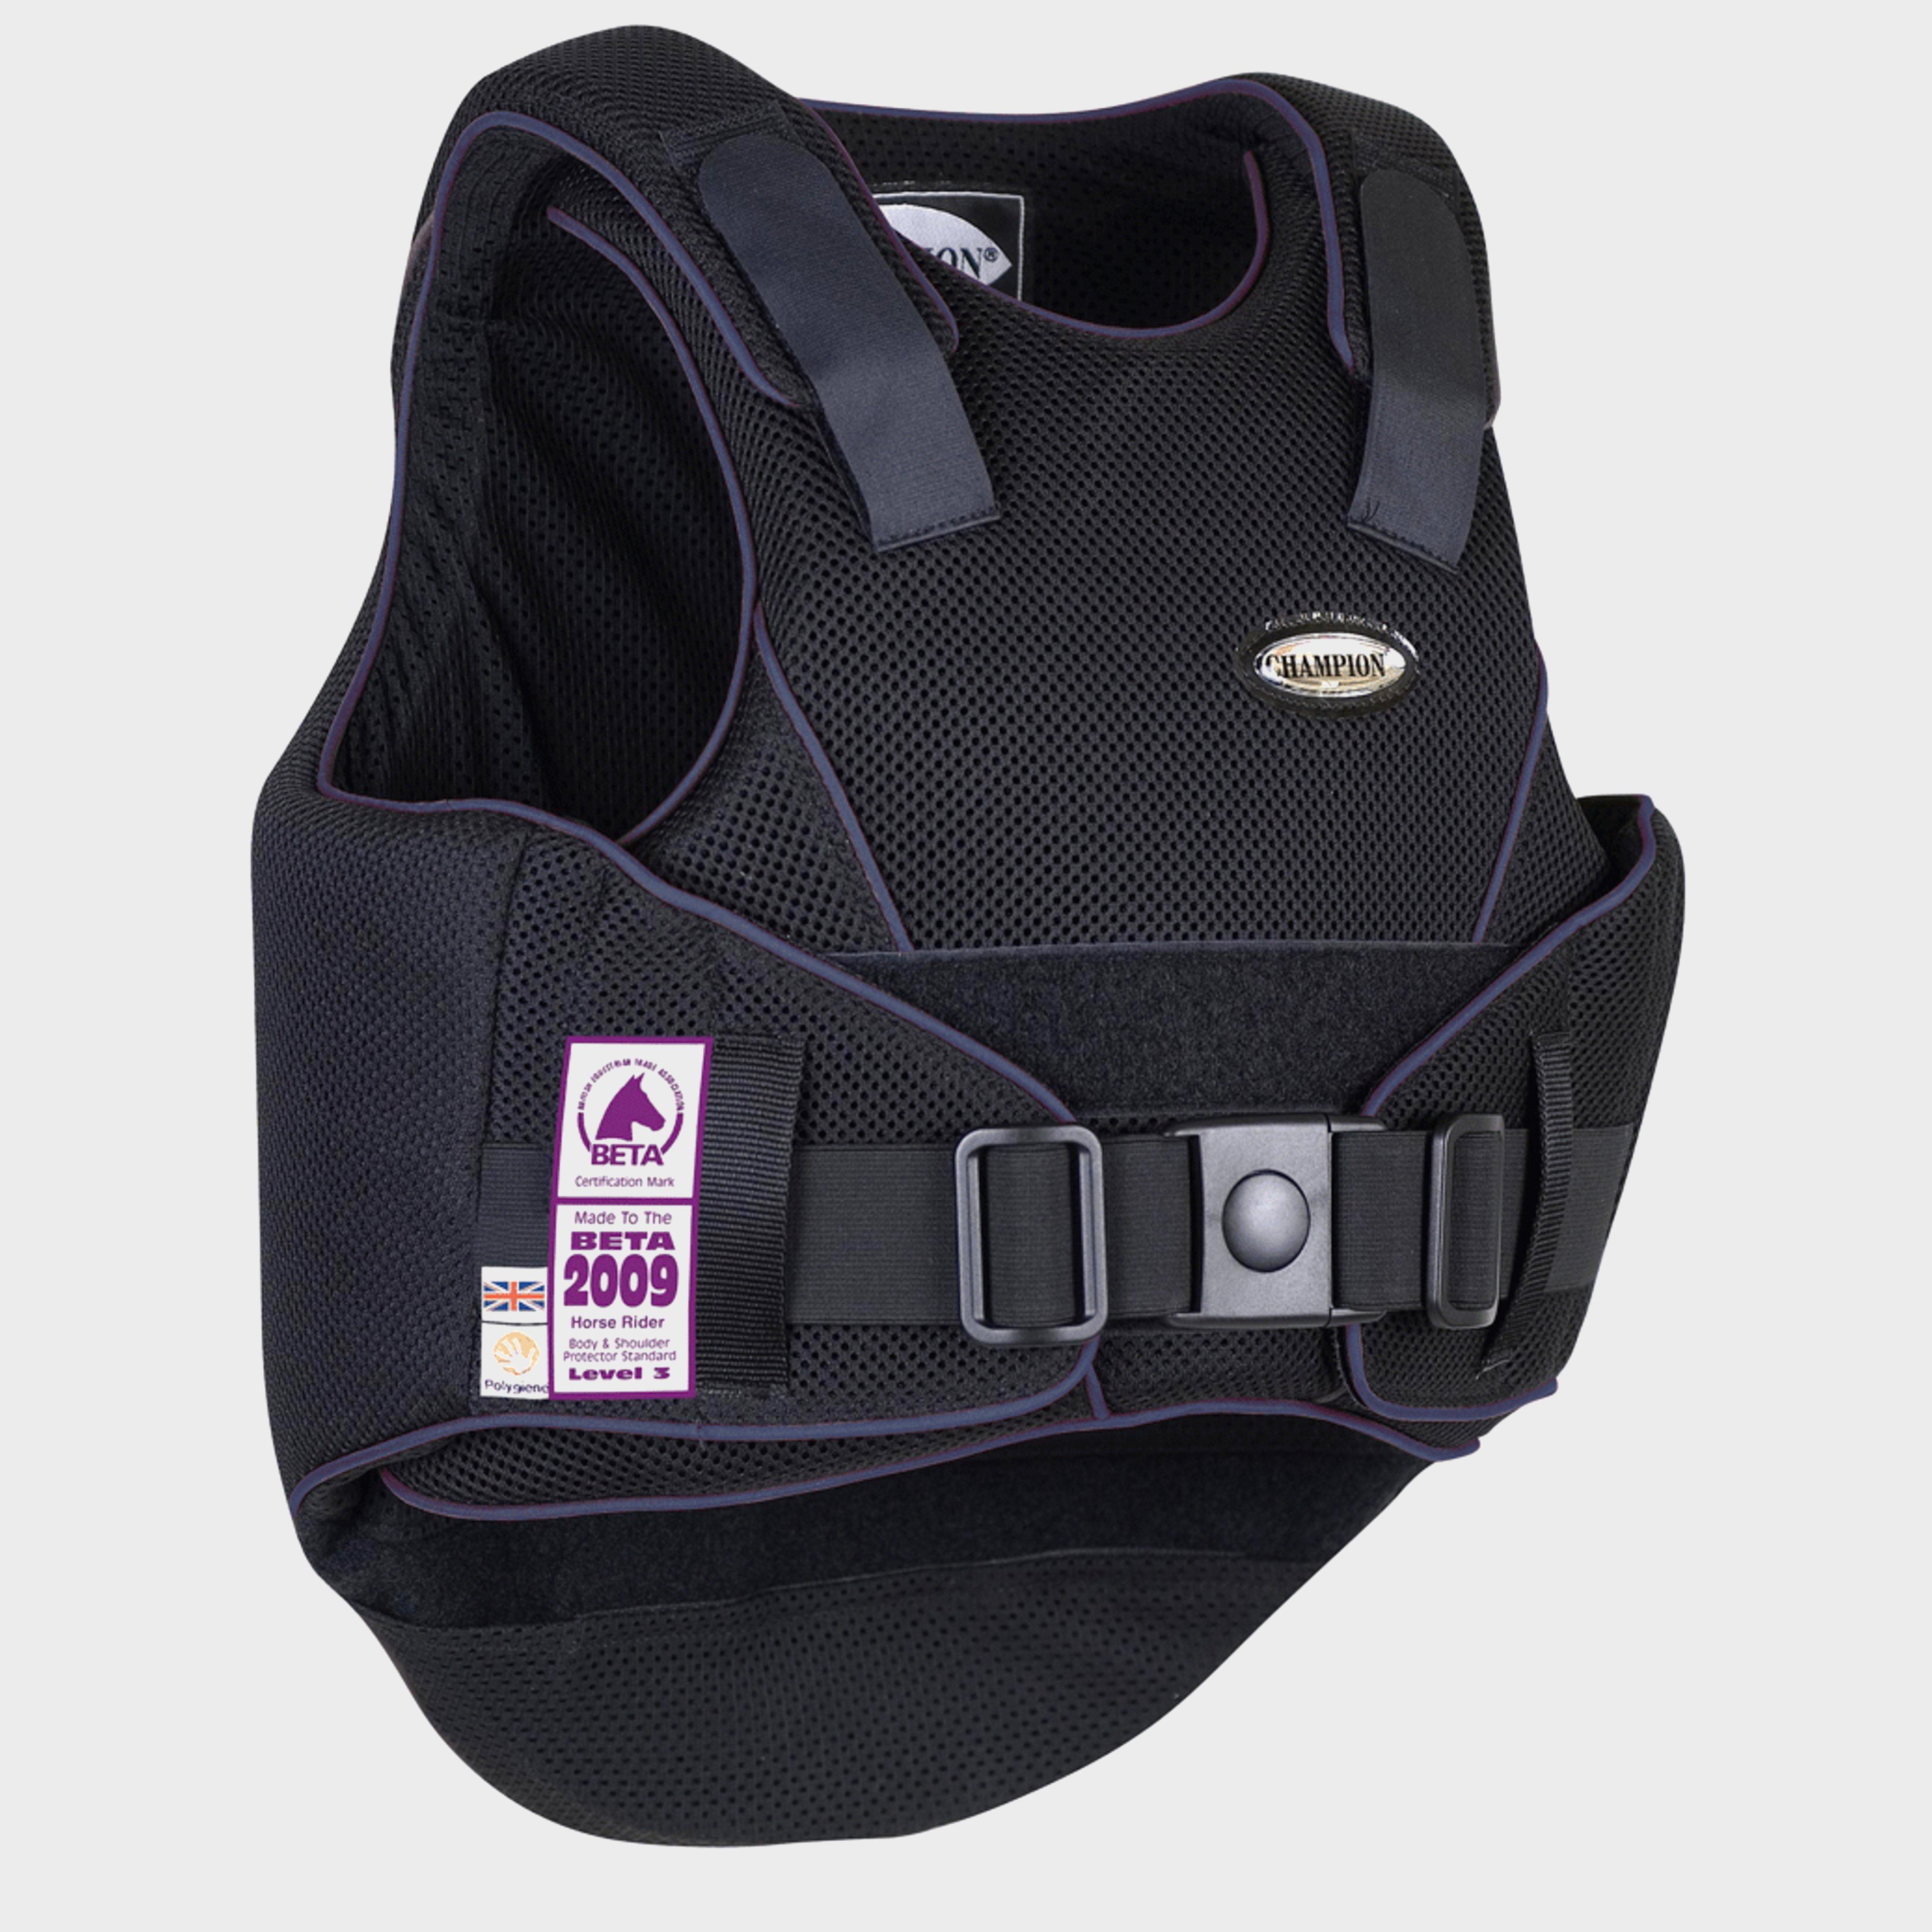 Image of Champion Flexair Body Protector (Small) - Black/[Xl], Black/[XL]